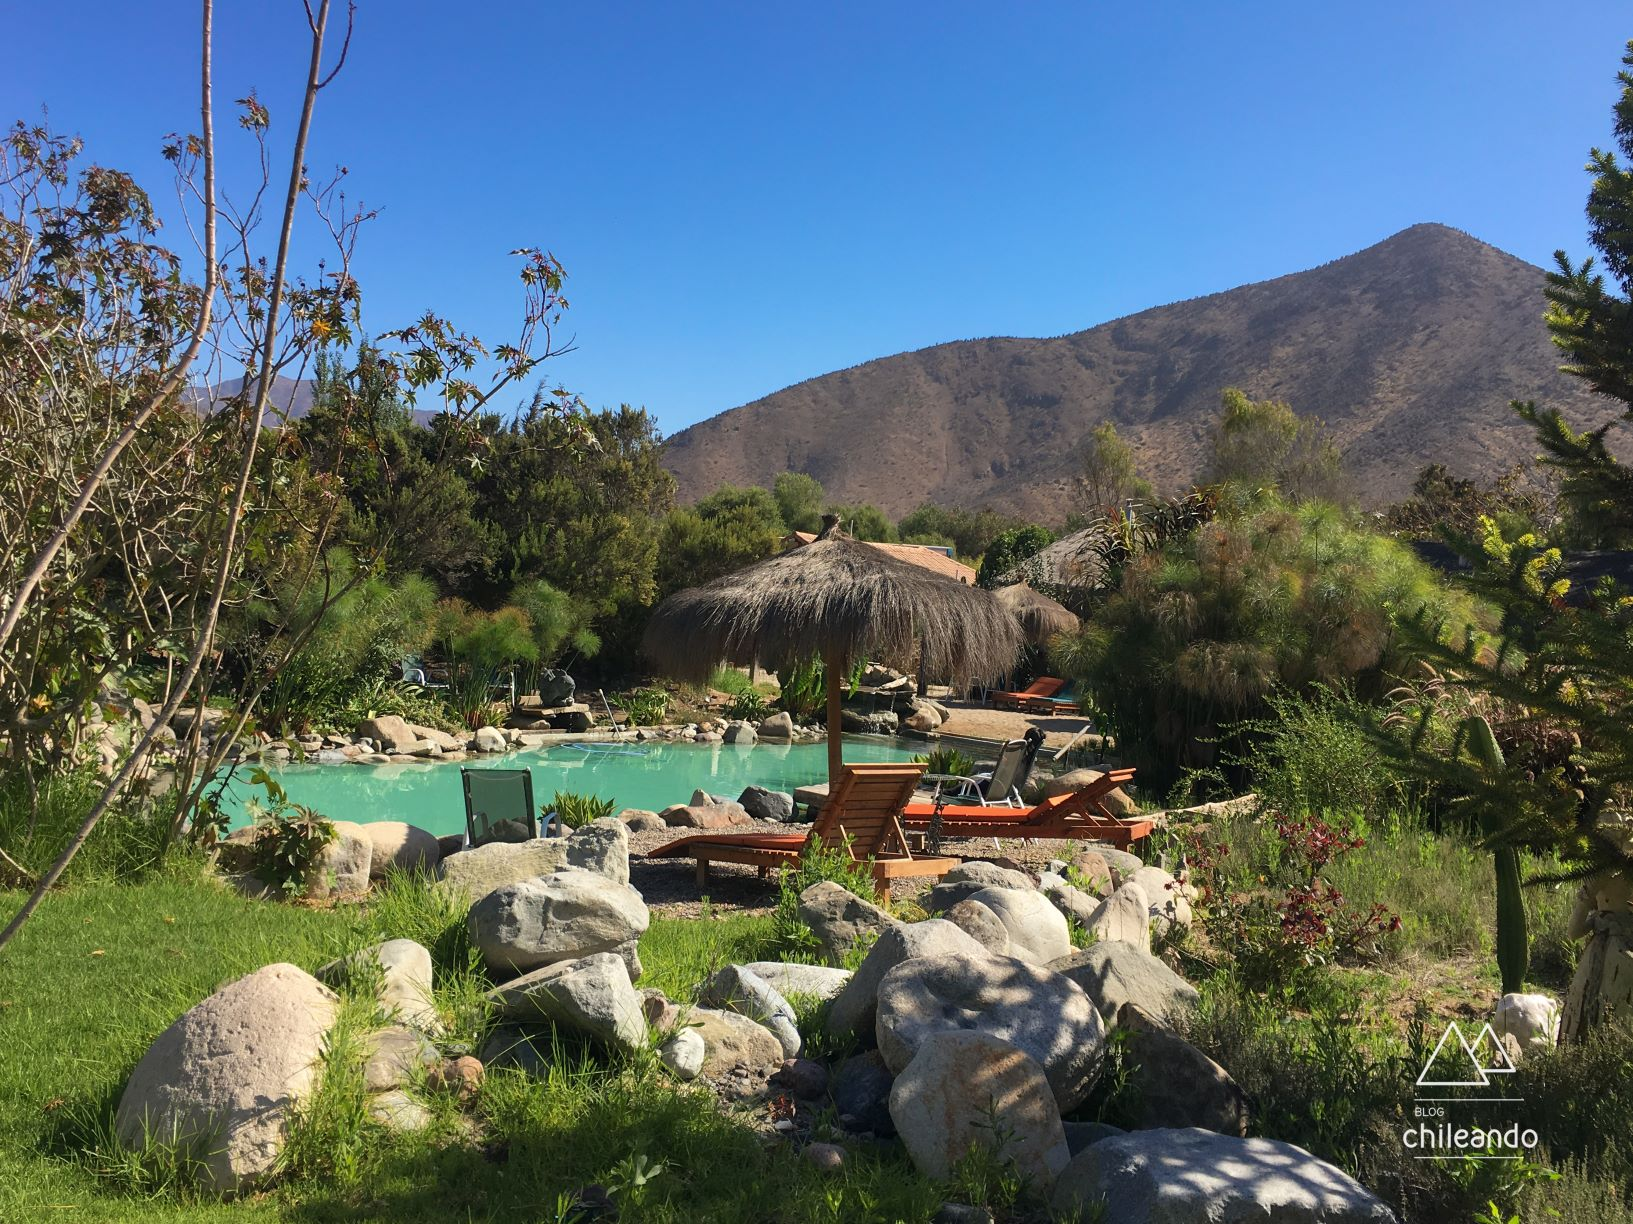 Área da piscina natural do Refúgio El Molle